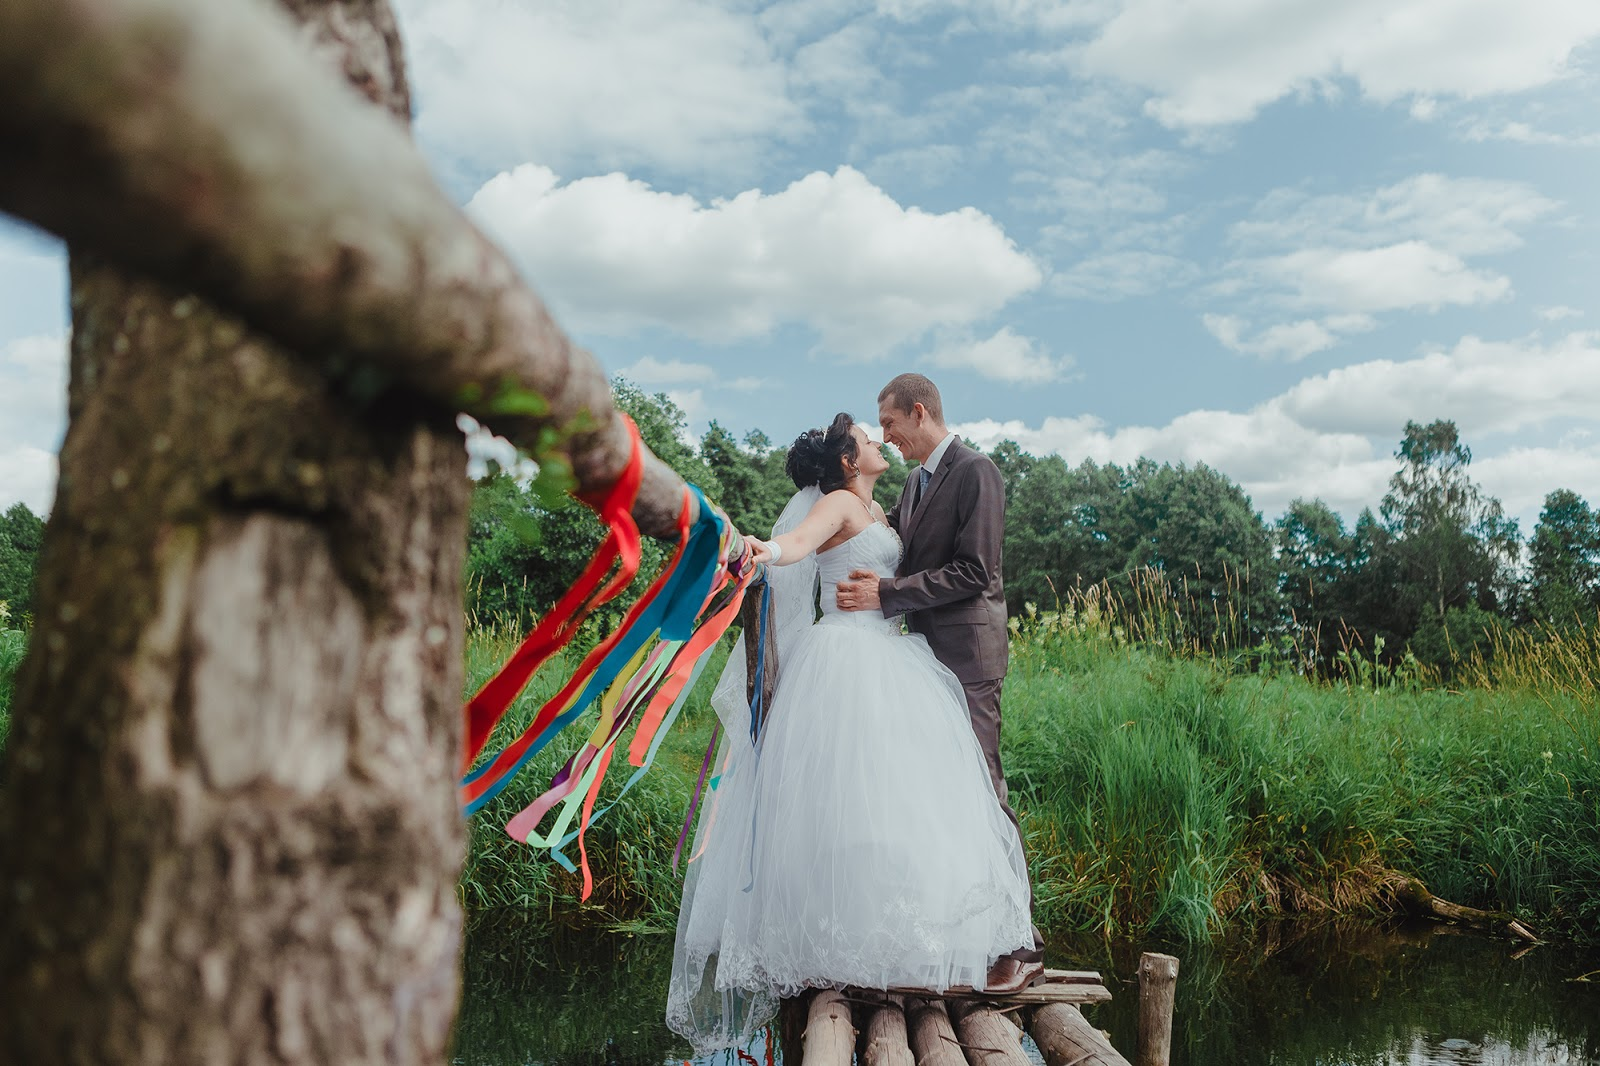 Фото и видеосъёмка на свадьбу во владимире